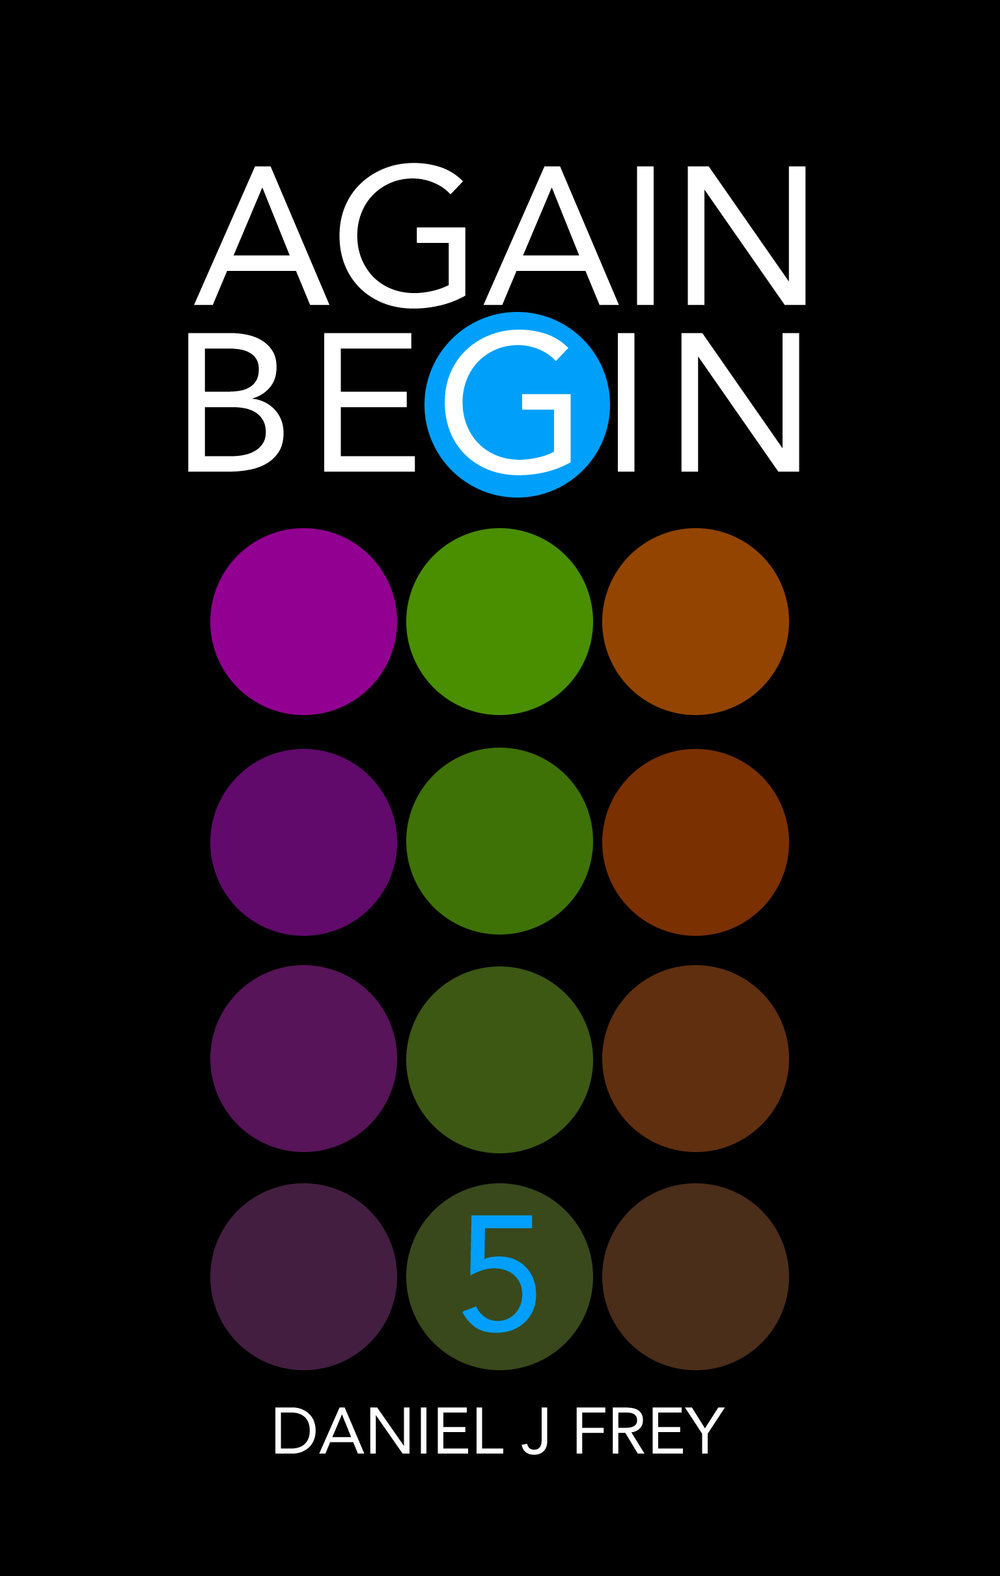 Again Begin 5 - A New World